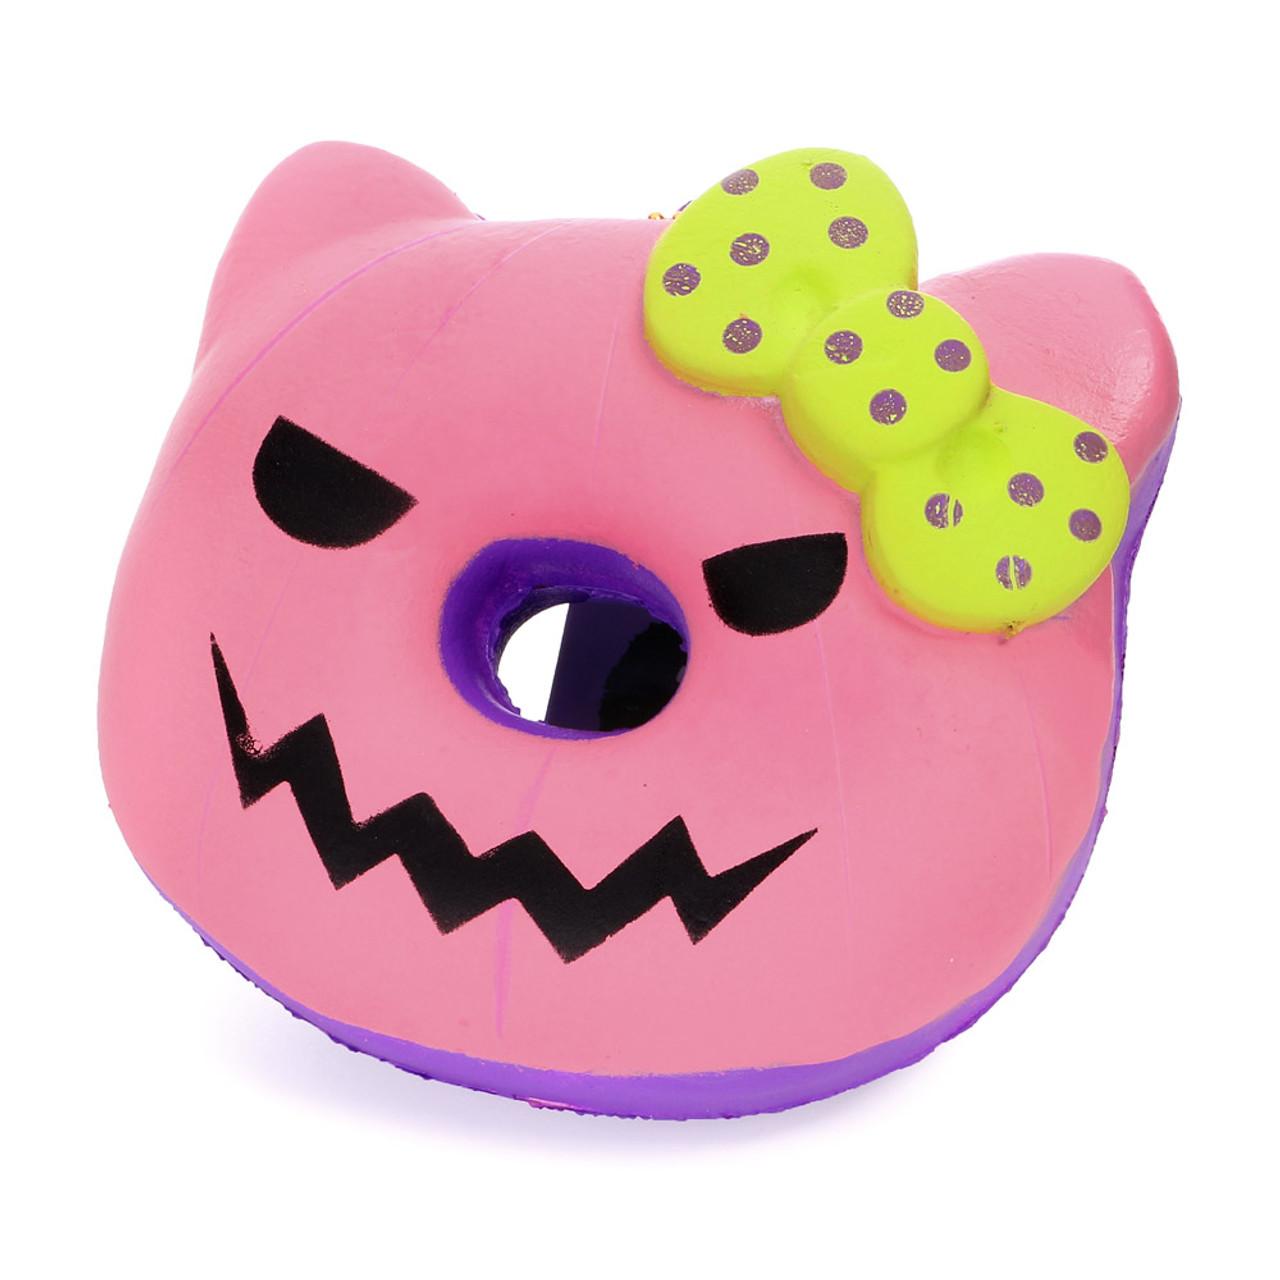 Sanrio Hello Kitty Halloween Pink Pumpkin Donut Squishy   cute wares